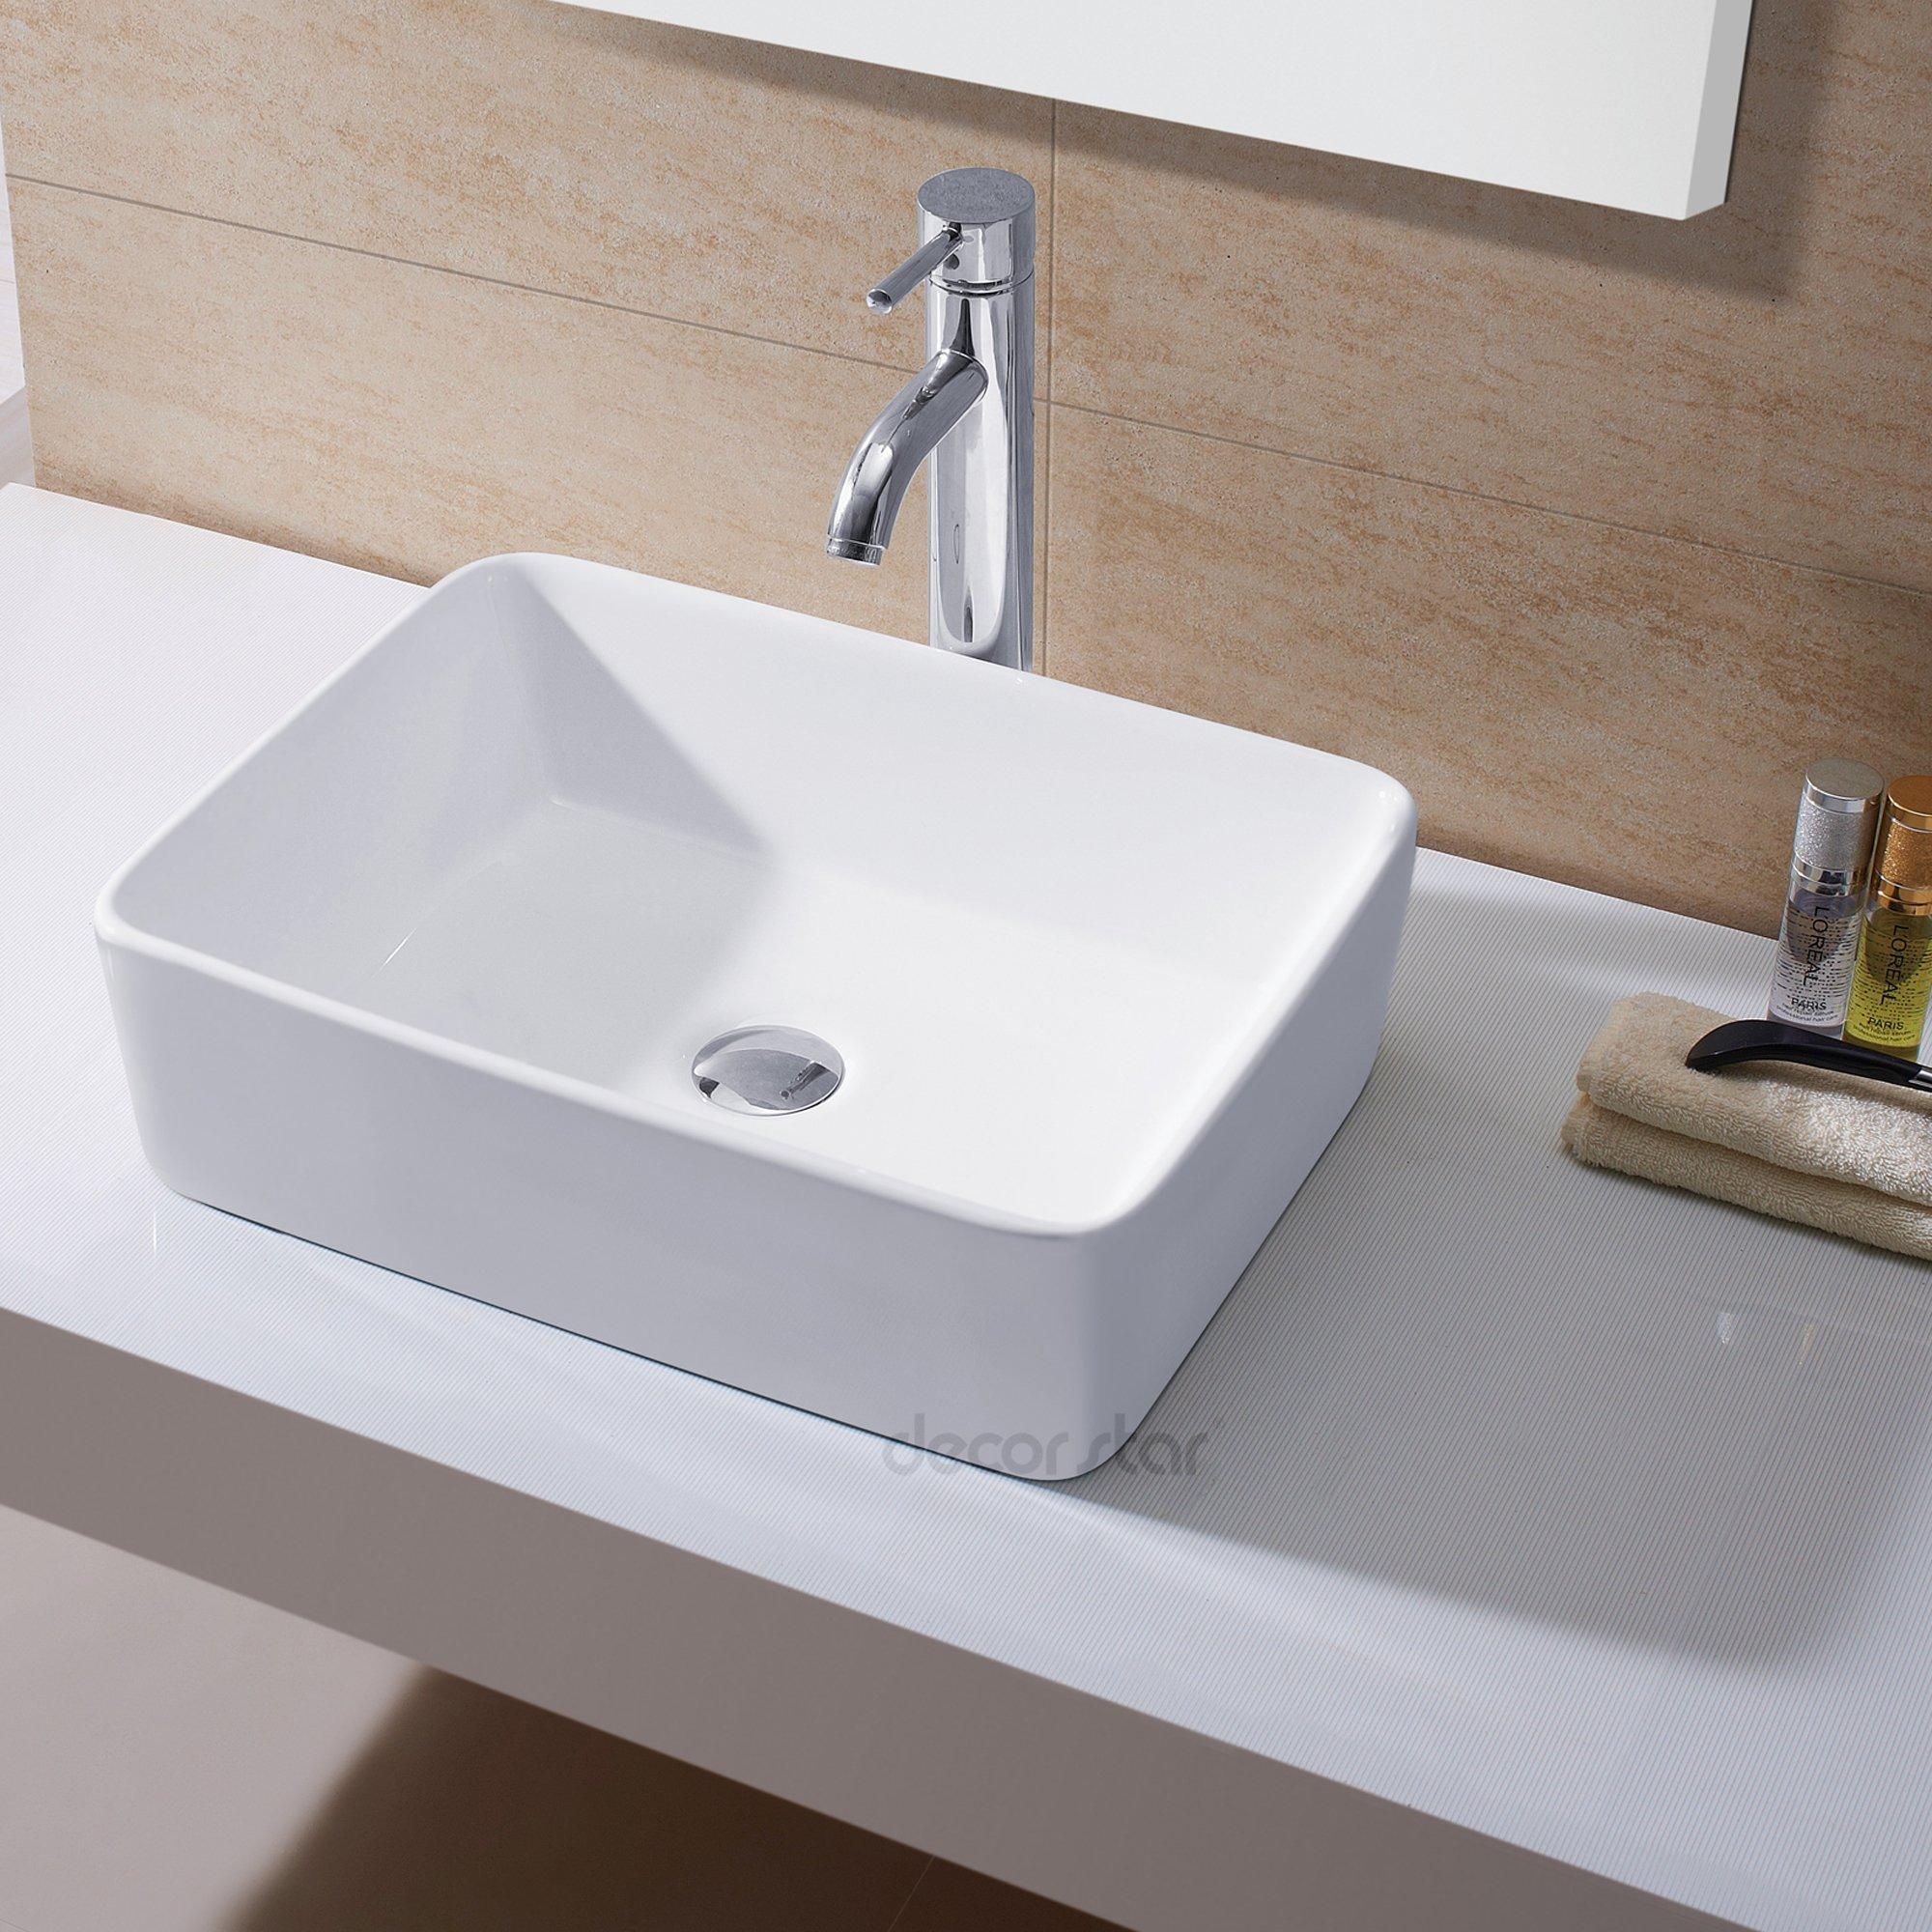 Decor Star CB-013 Bathroom Porcelain Ceramic Vessel Vanity Sink Art Basin